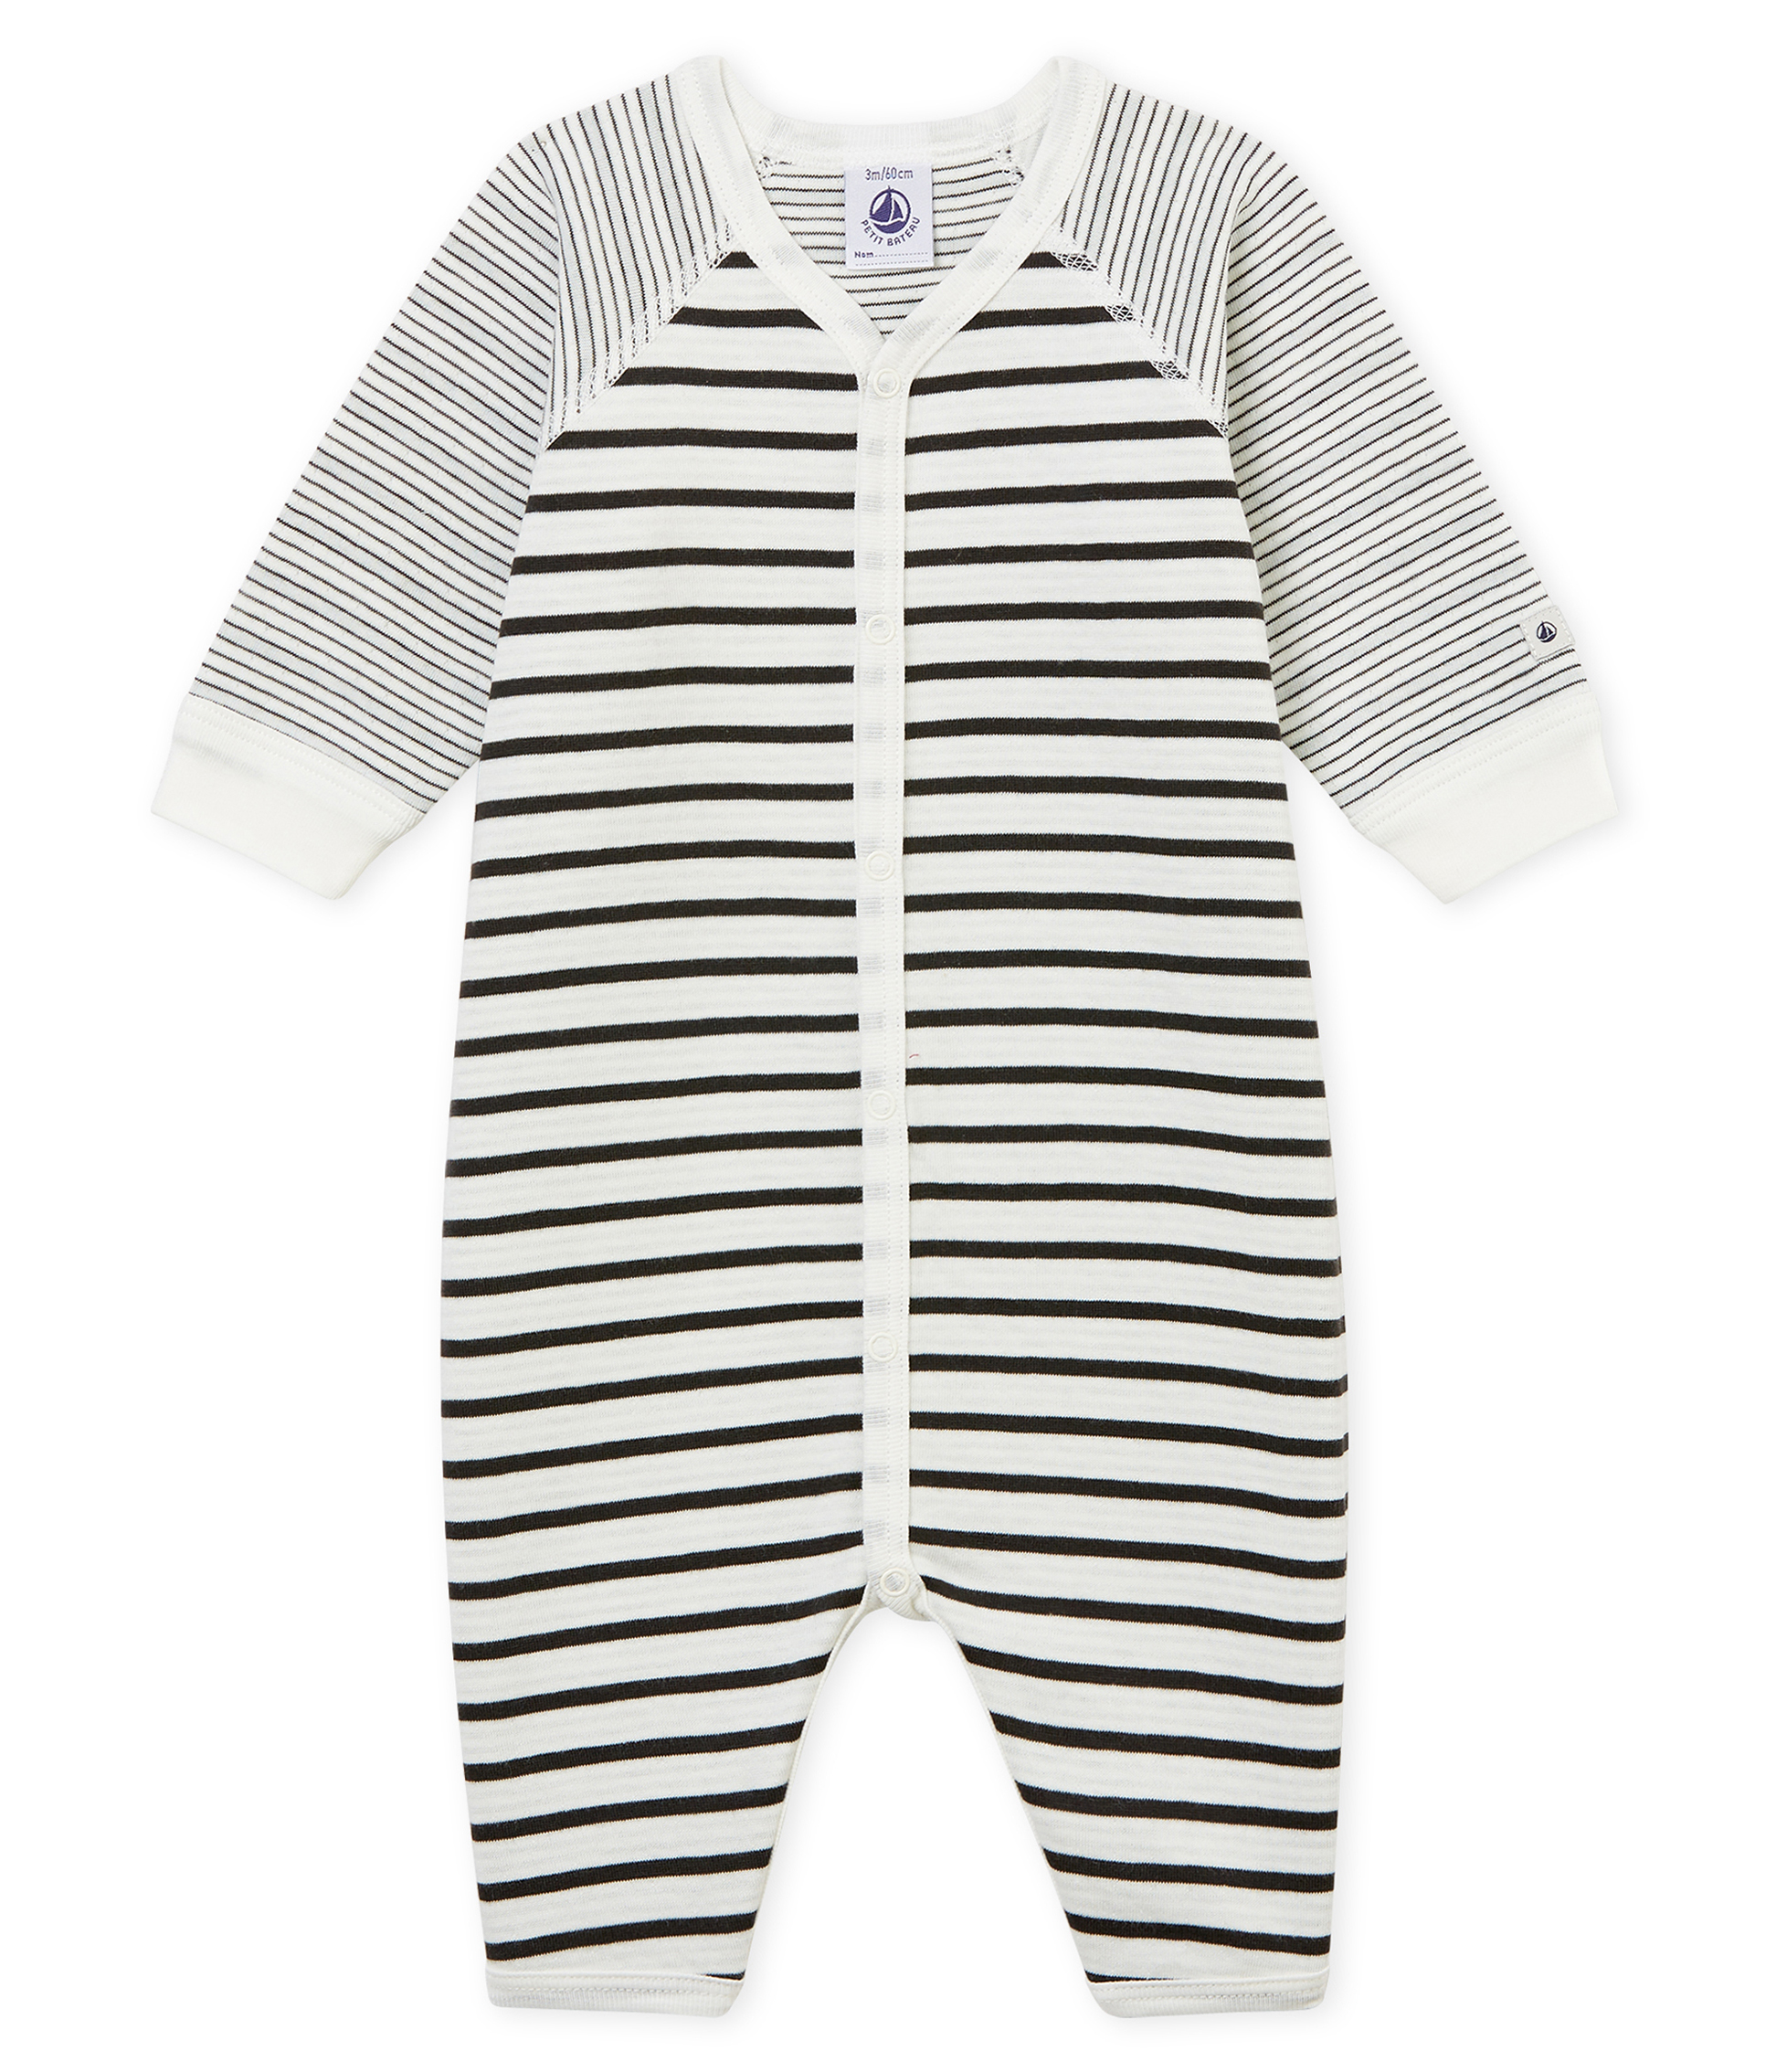 54186d458 Pijama de bebé sin pies en tejido suave para niño | Petit Bateau